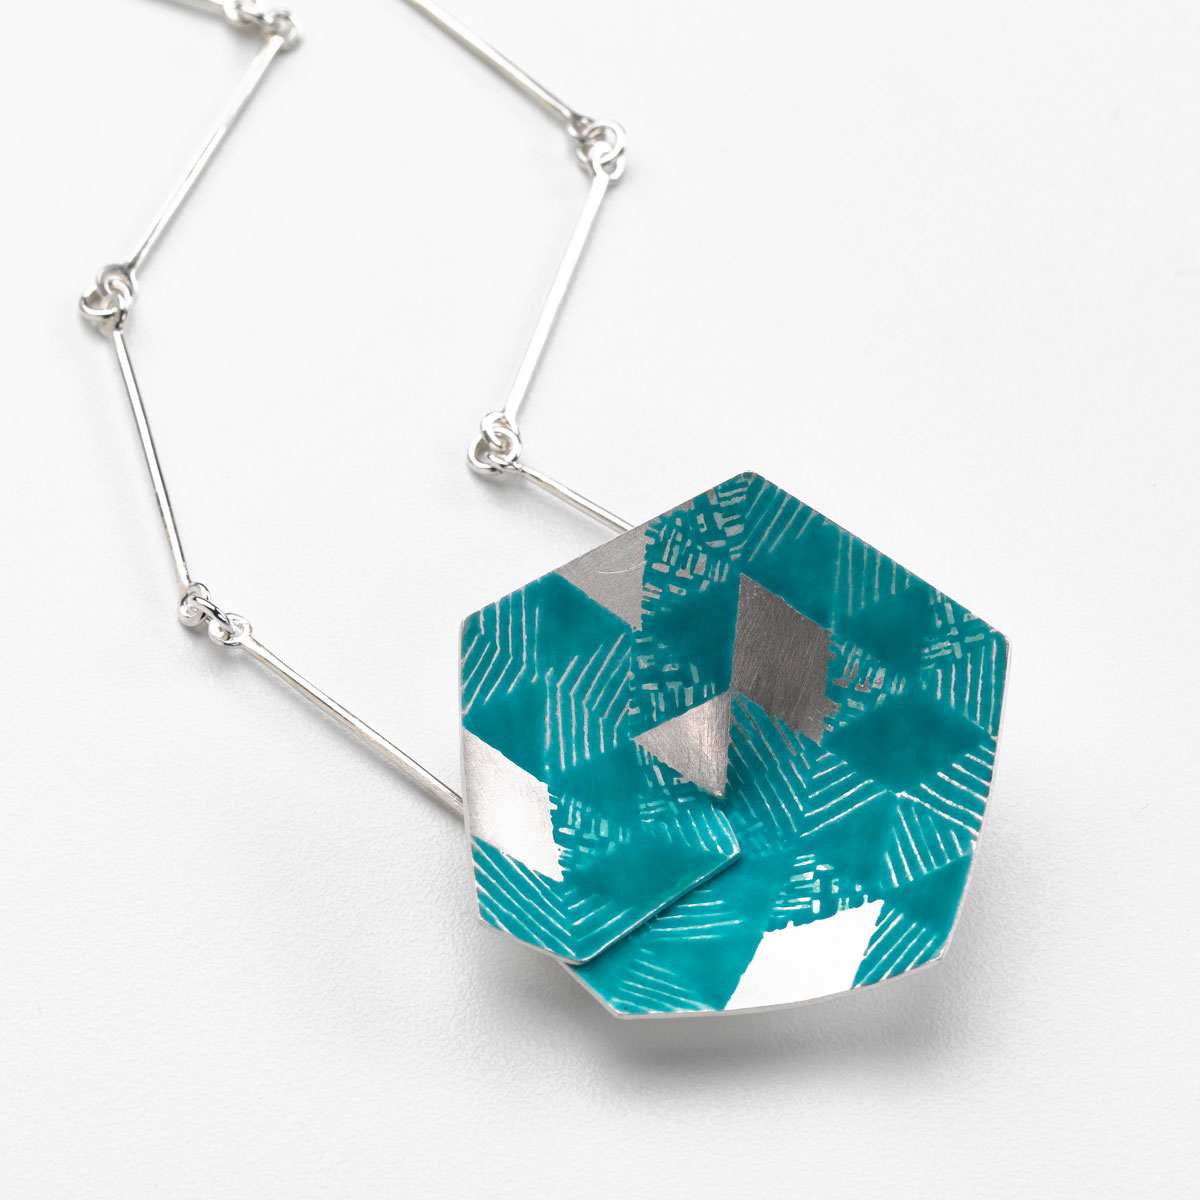 'Weave' Hexagon Pendant Large (Turquoise)